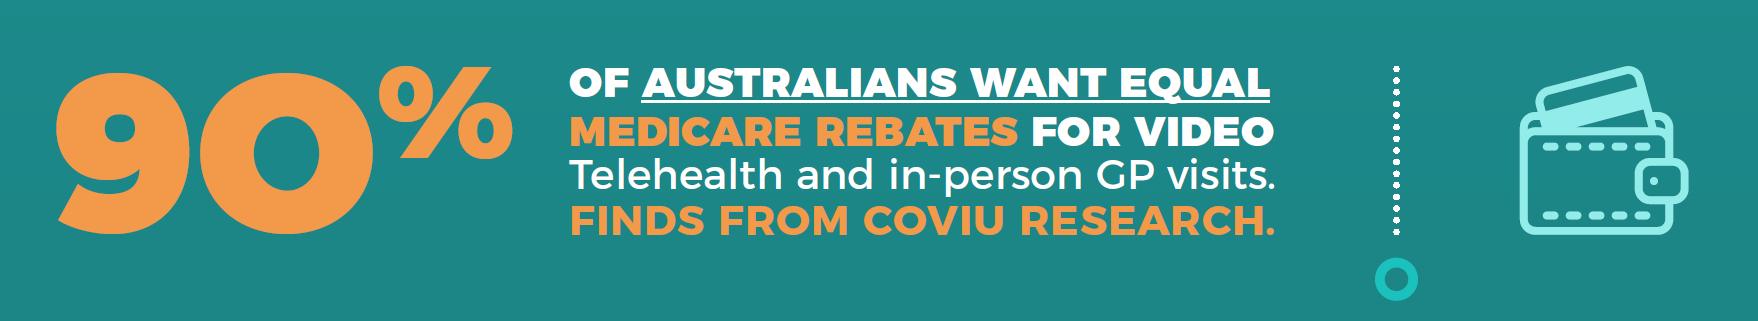 90% of Aussies want equal Medicare rebates